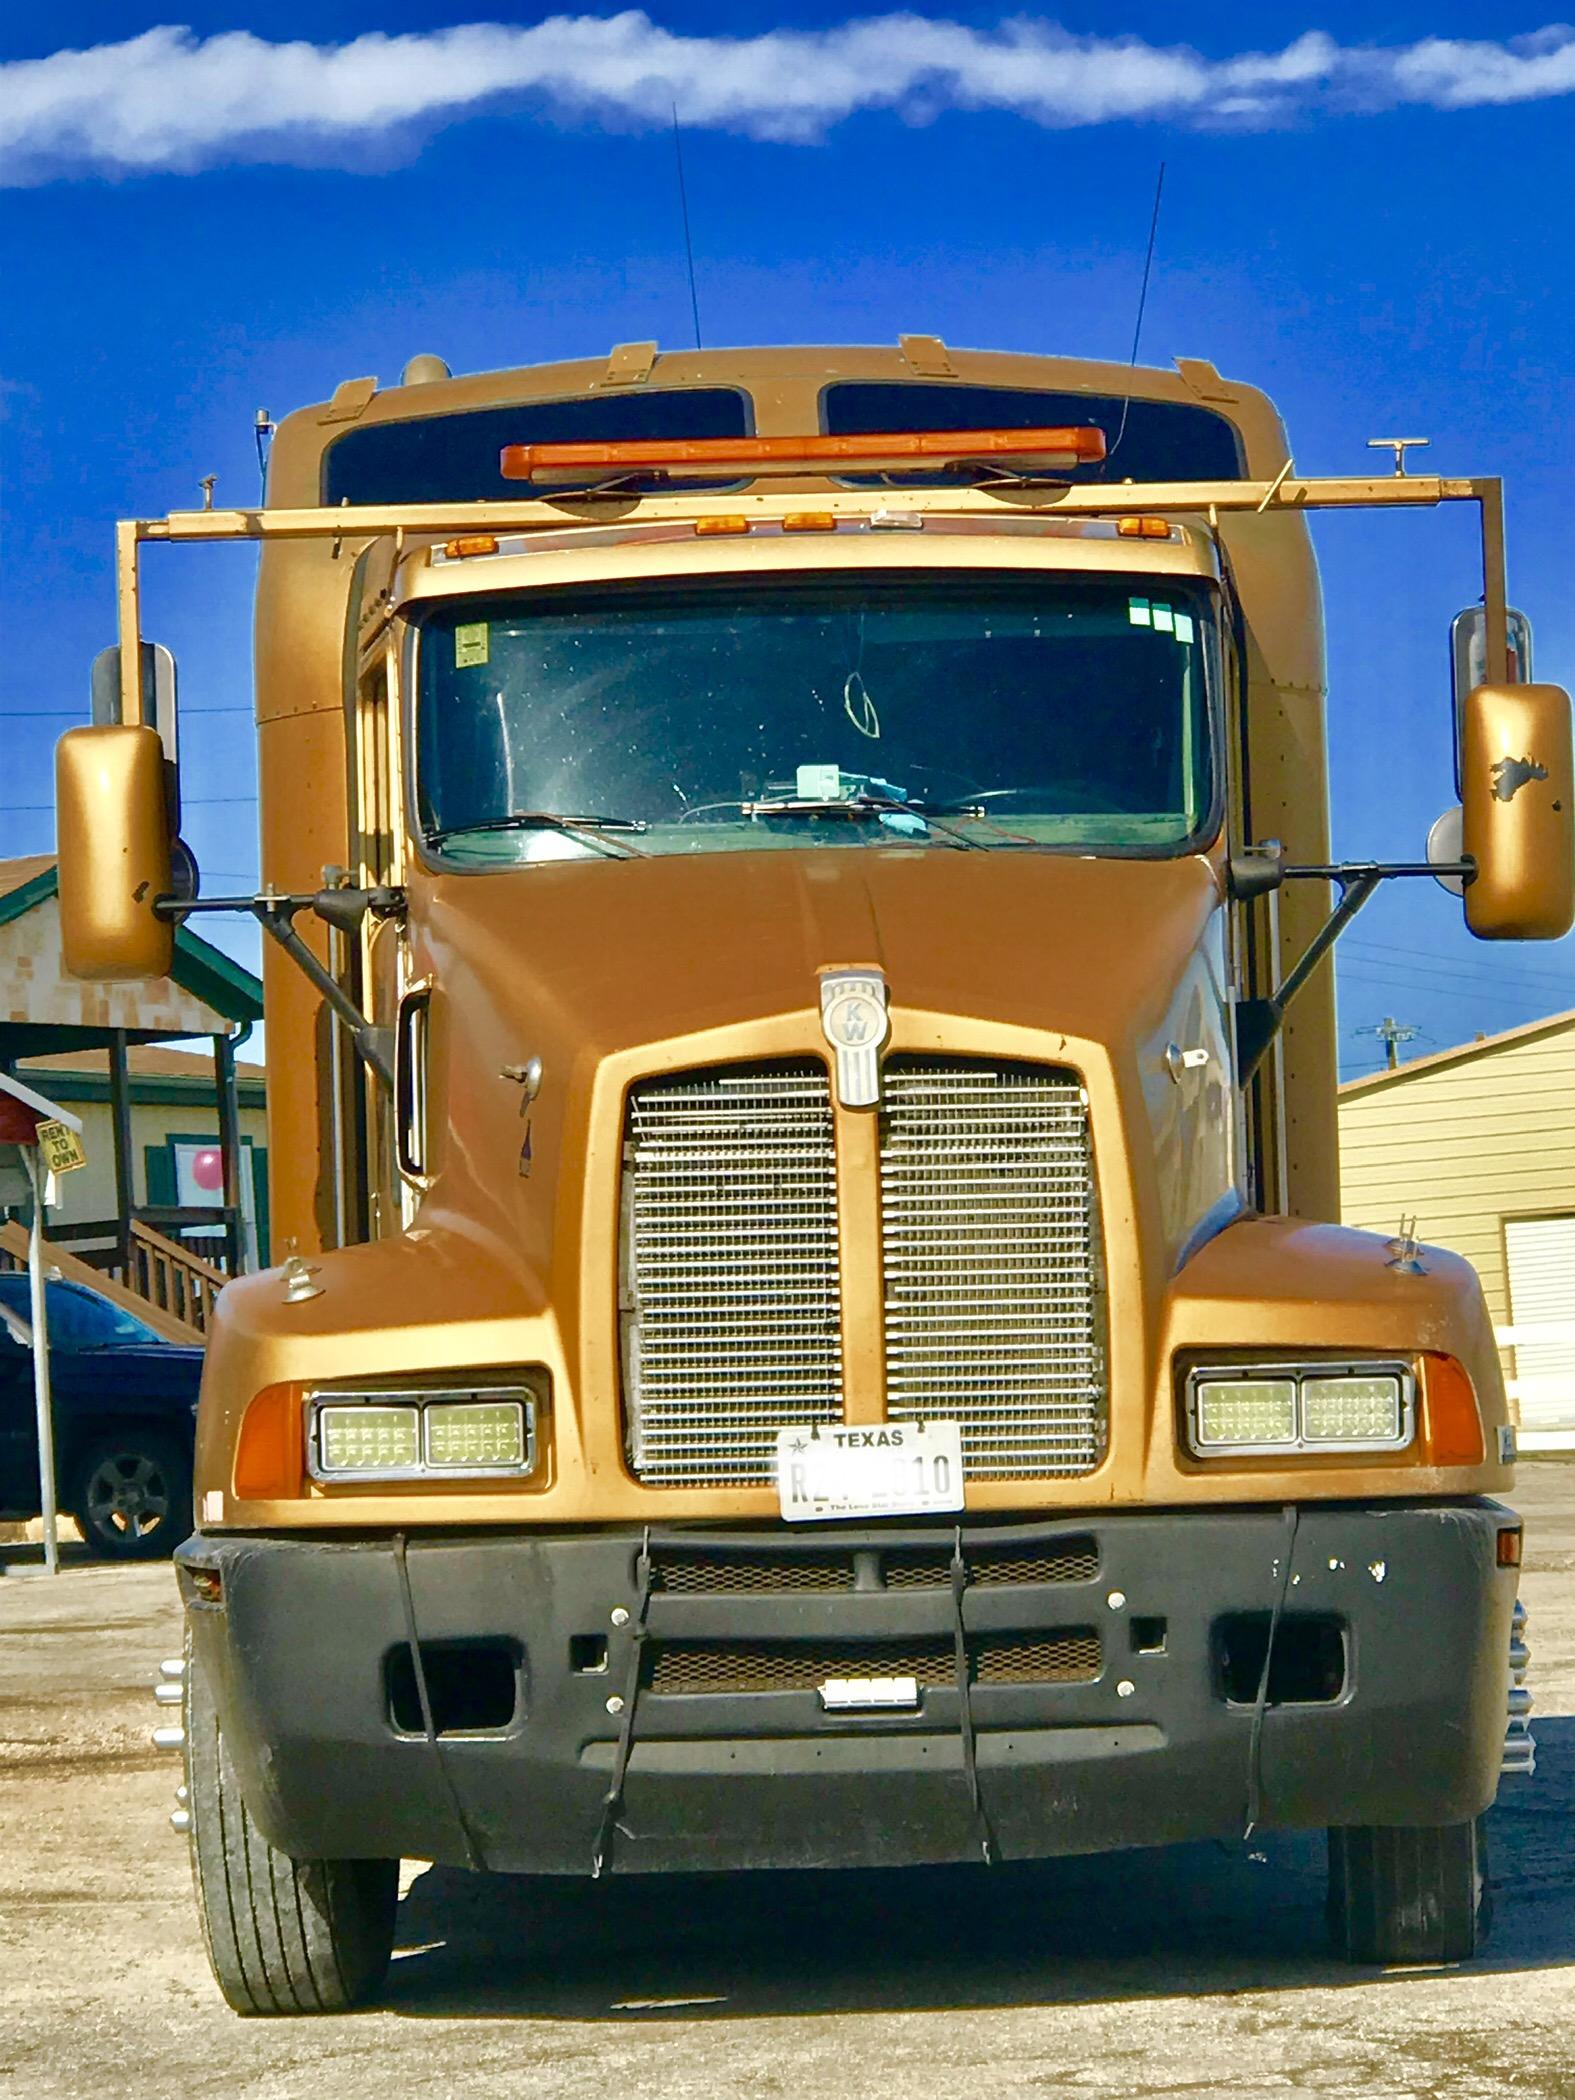 Mobile home transport services. transport truclks. manufactured home transport service